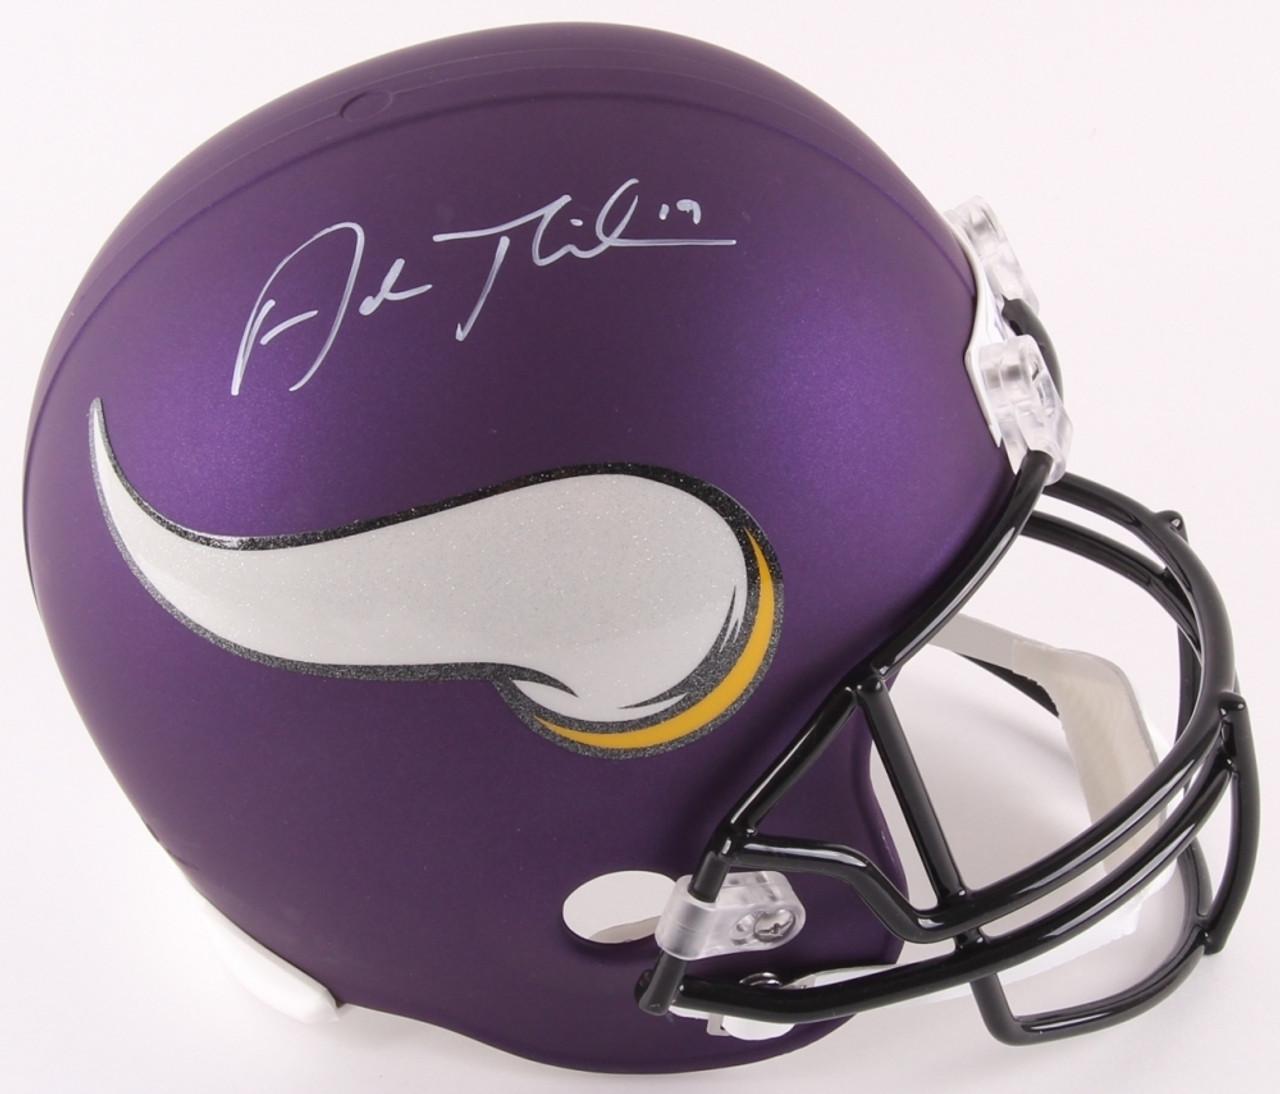 b4c221166c6 Adam Thielen Minnesota Vikings Autographed Replica Full Size Helmet ...